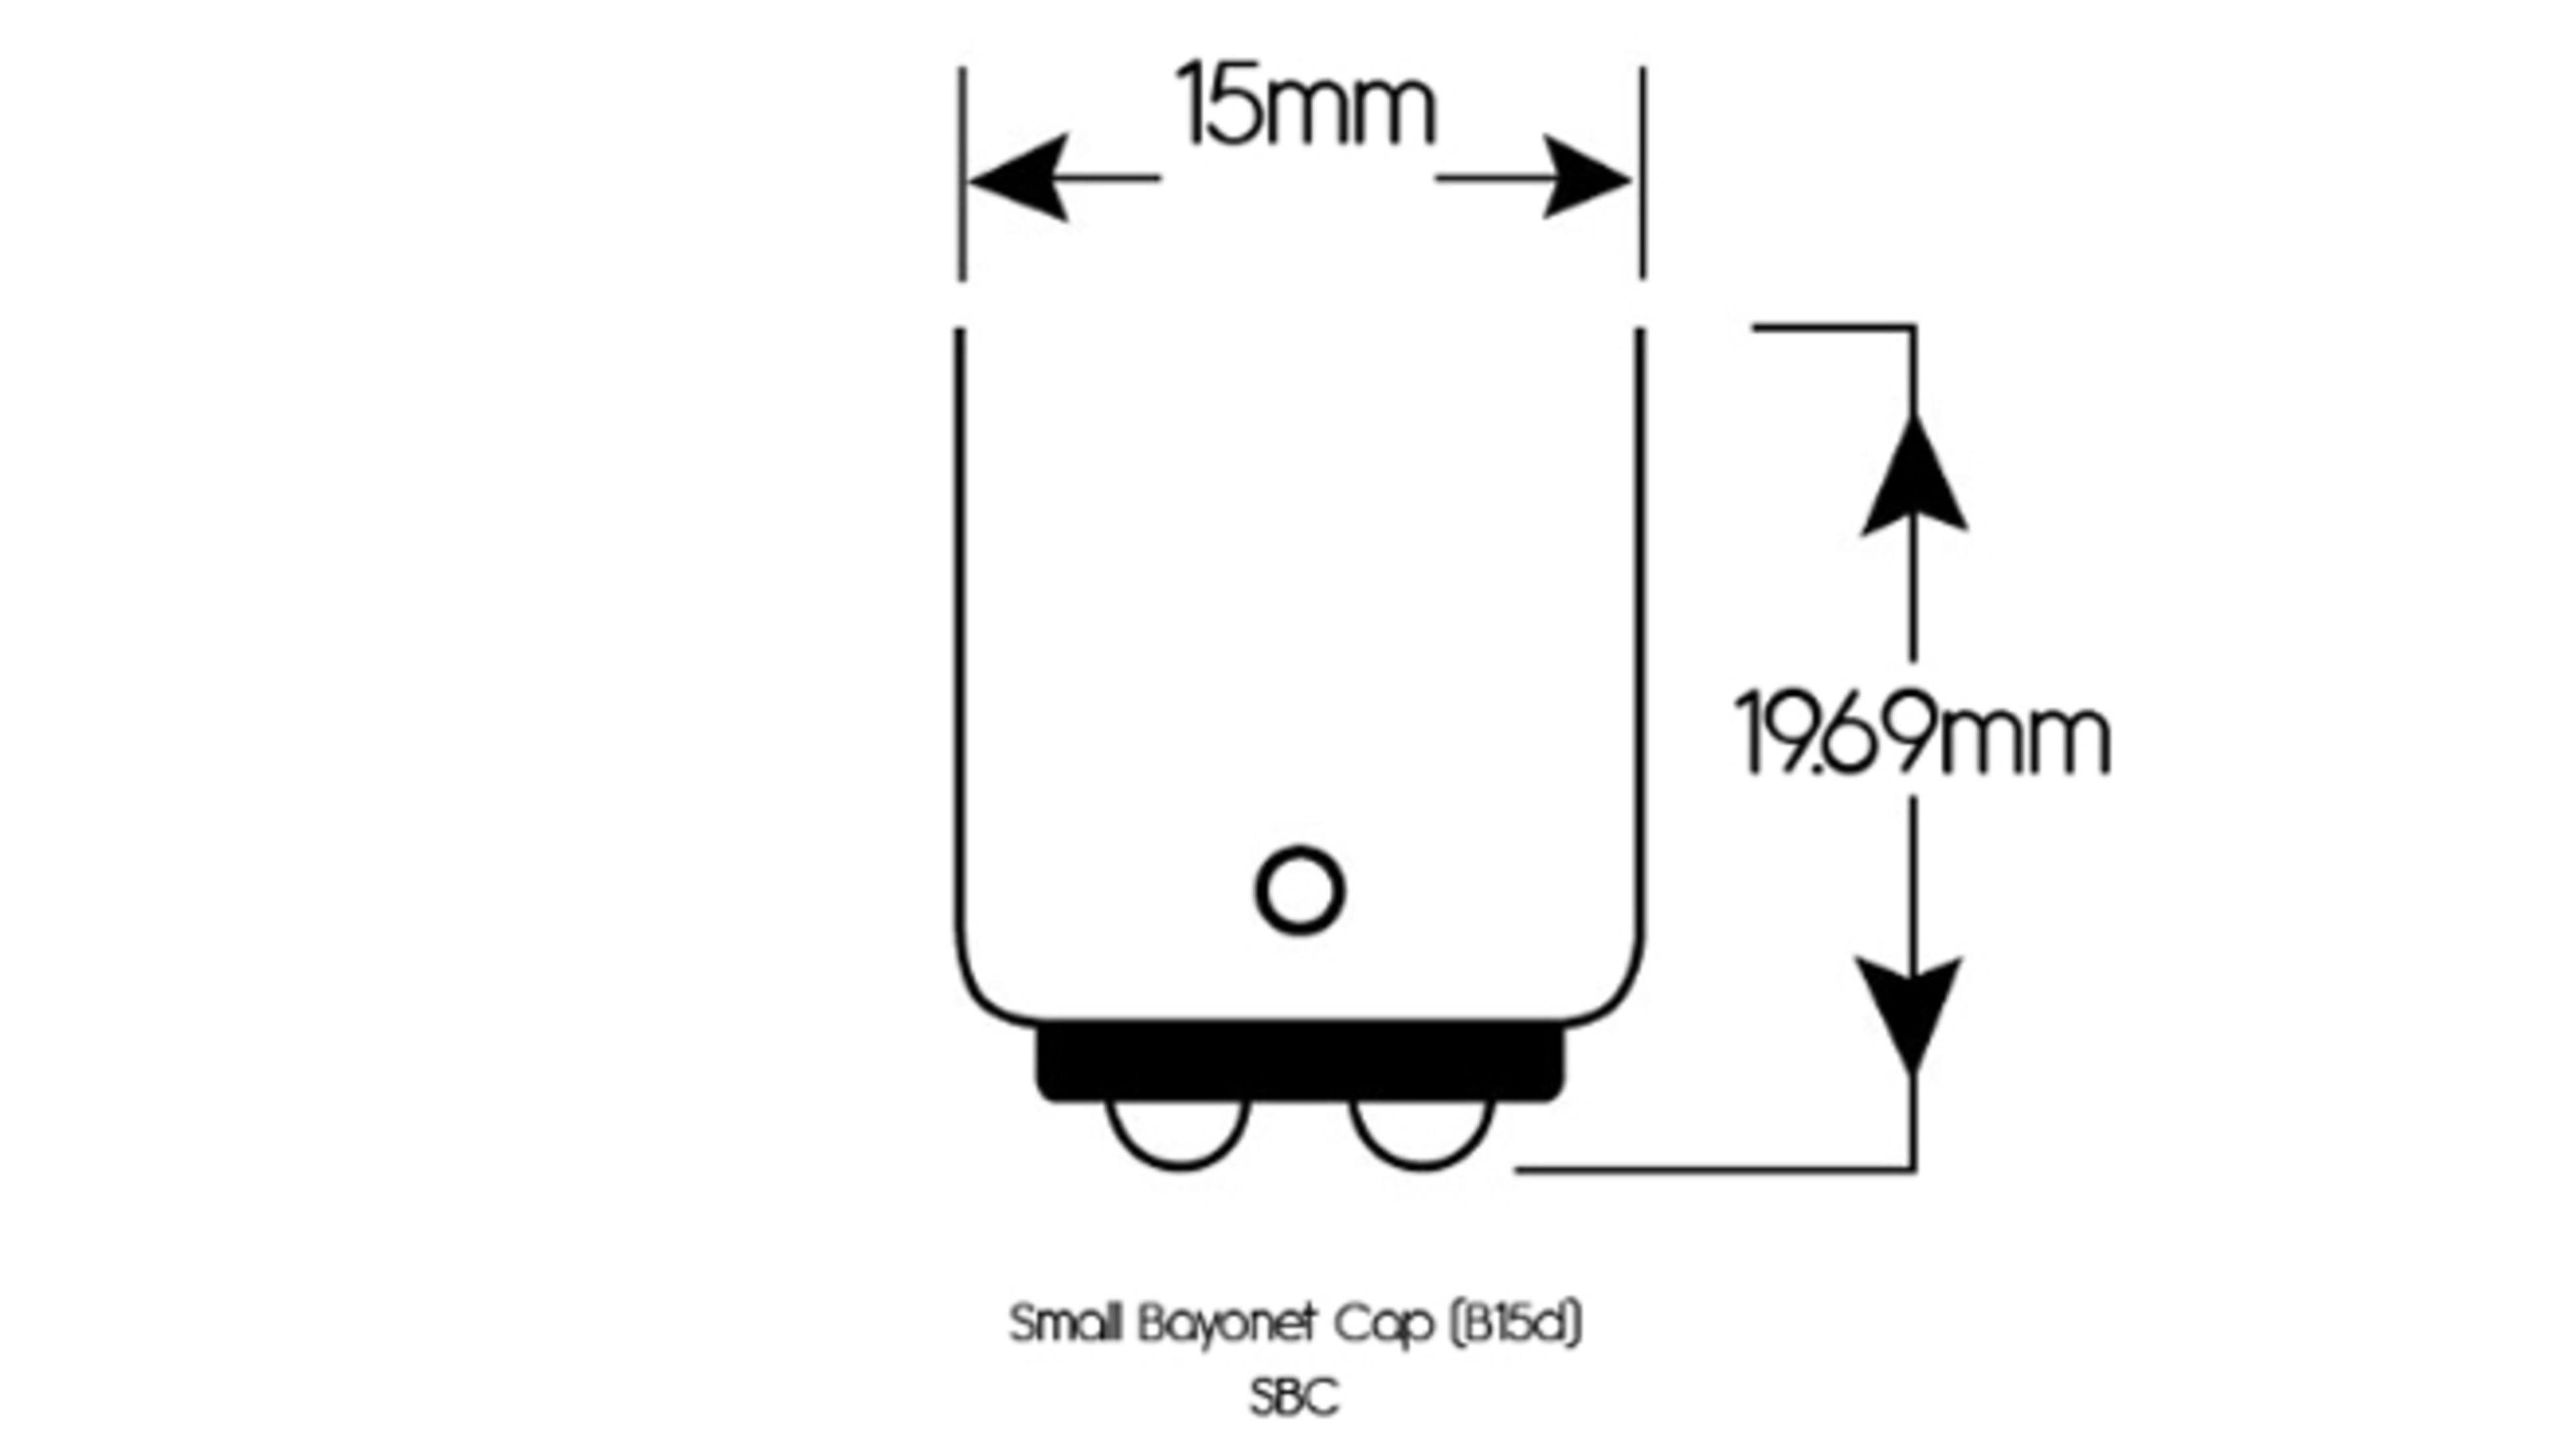 A diagram of a small bayonet cap globe.